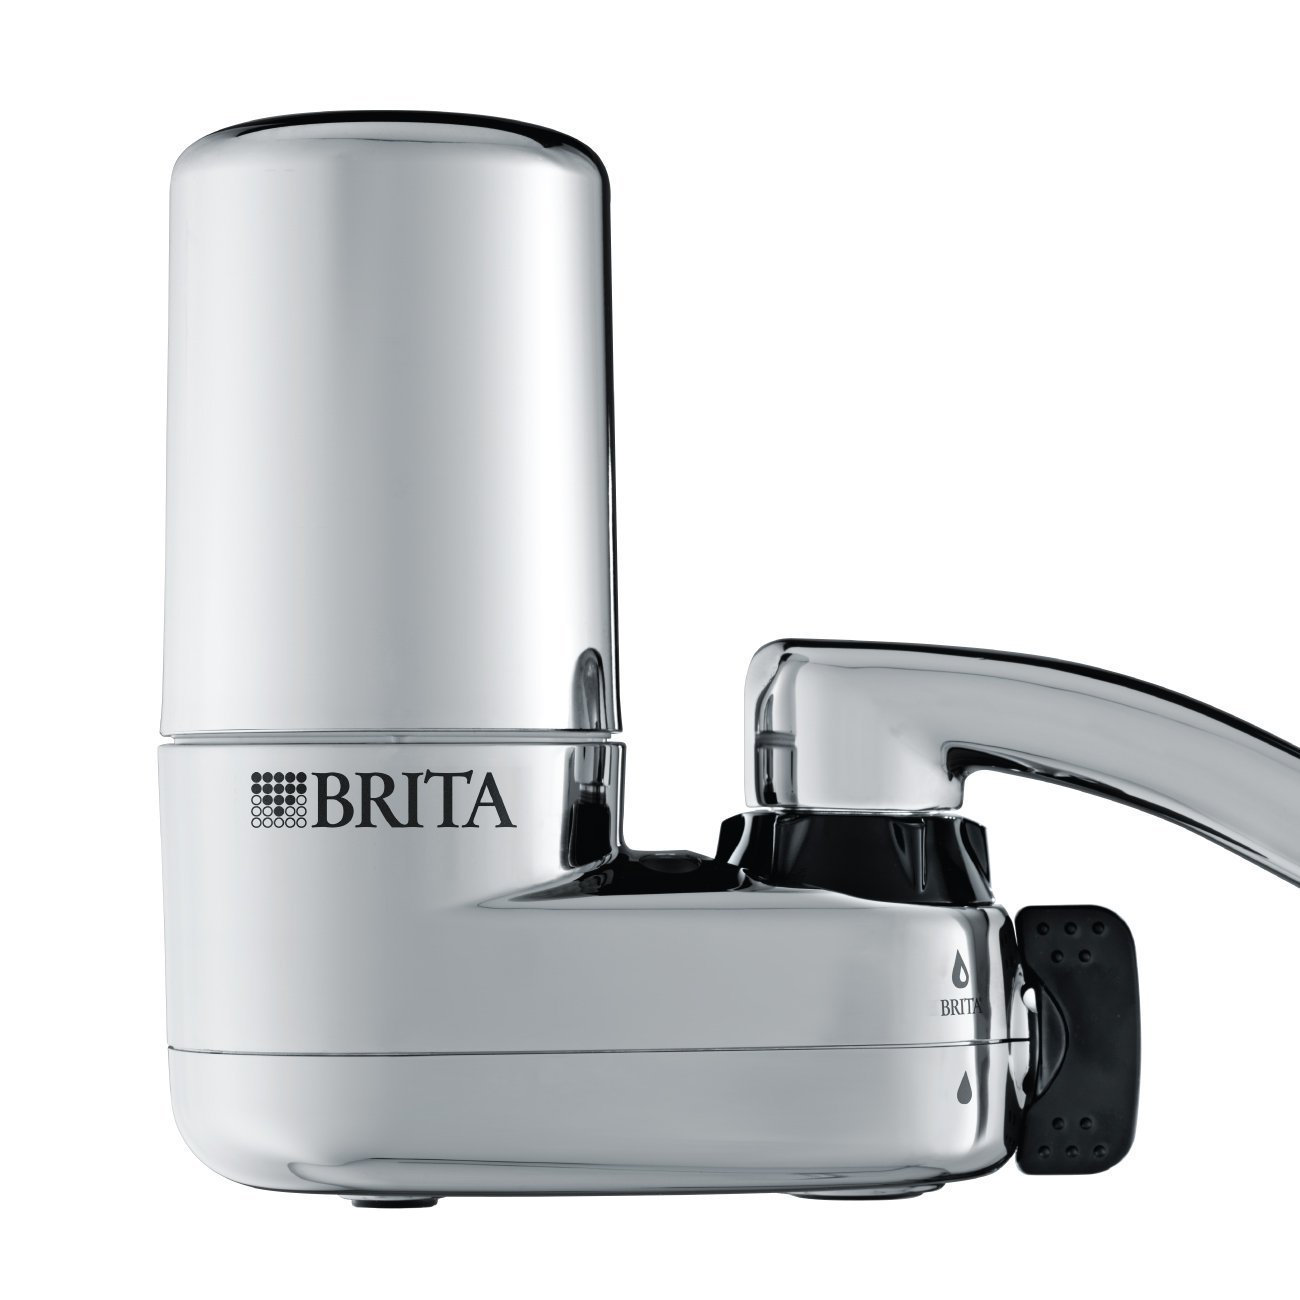 brita faucet filter